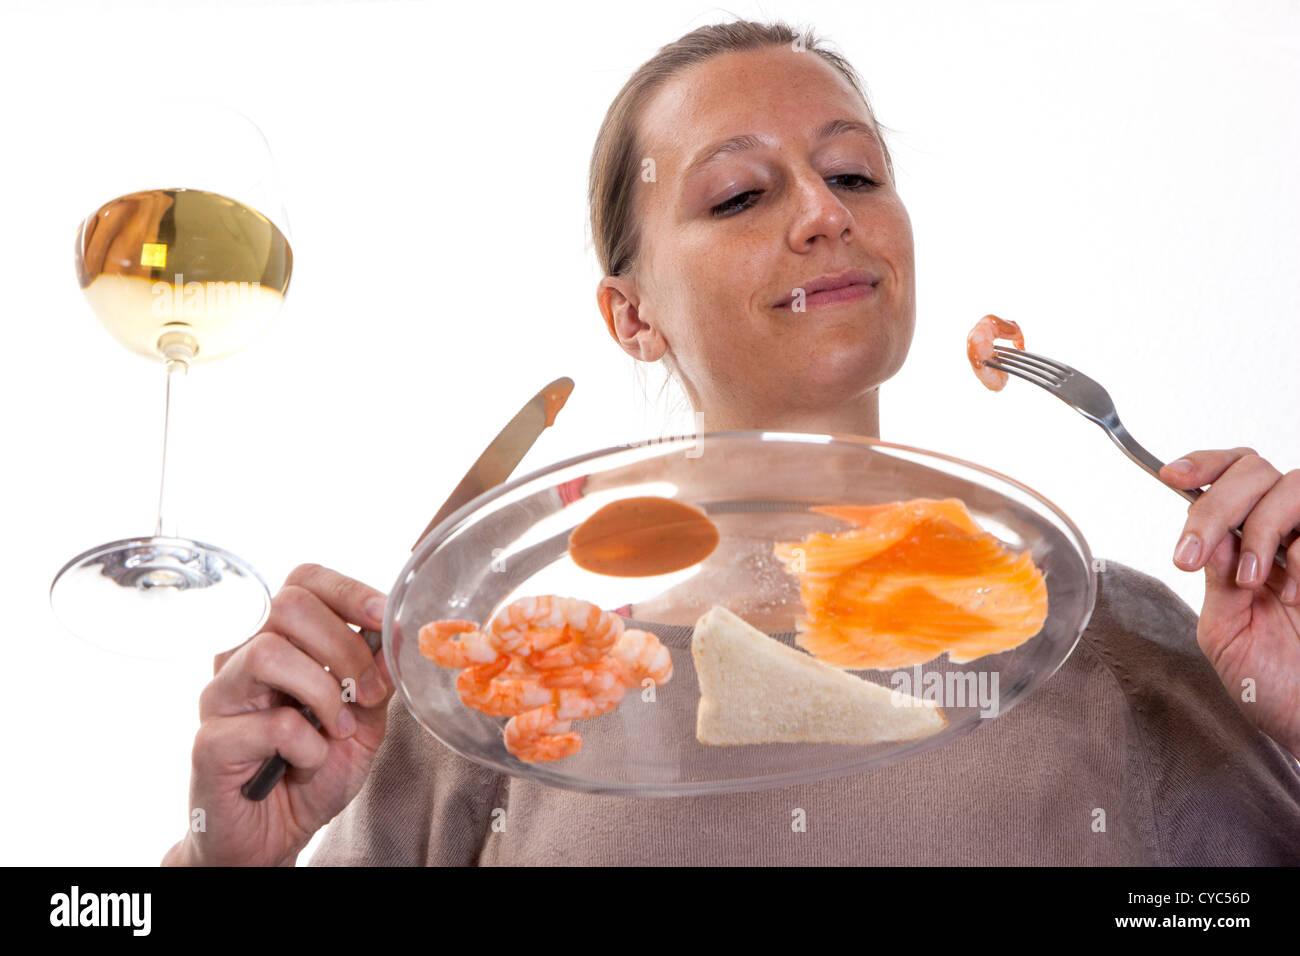 Cocktail Dressing Stockfotos & Cocktail Dressing Bilder - Alamy